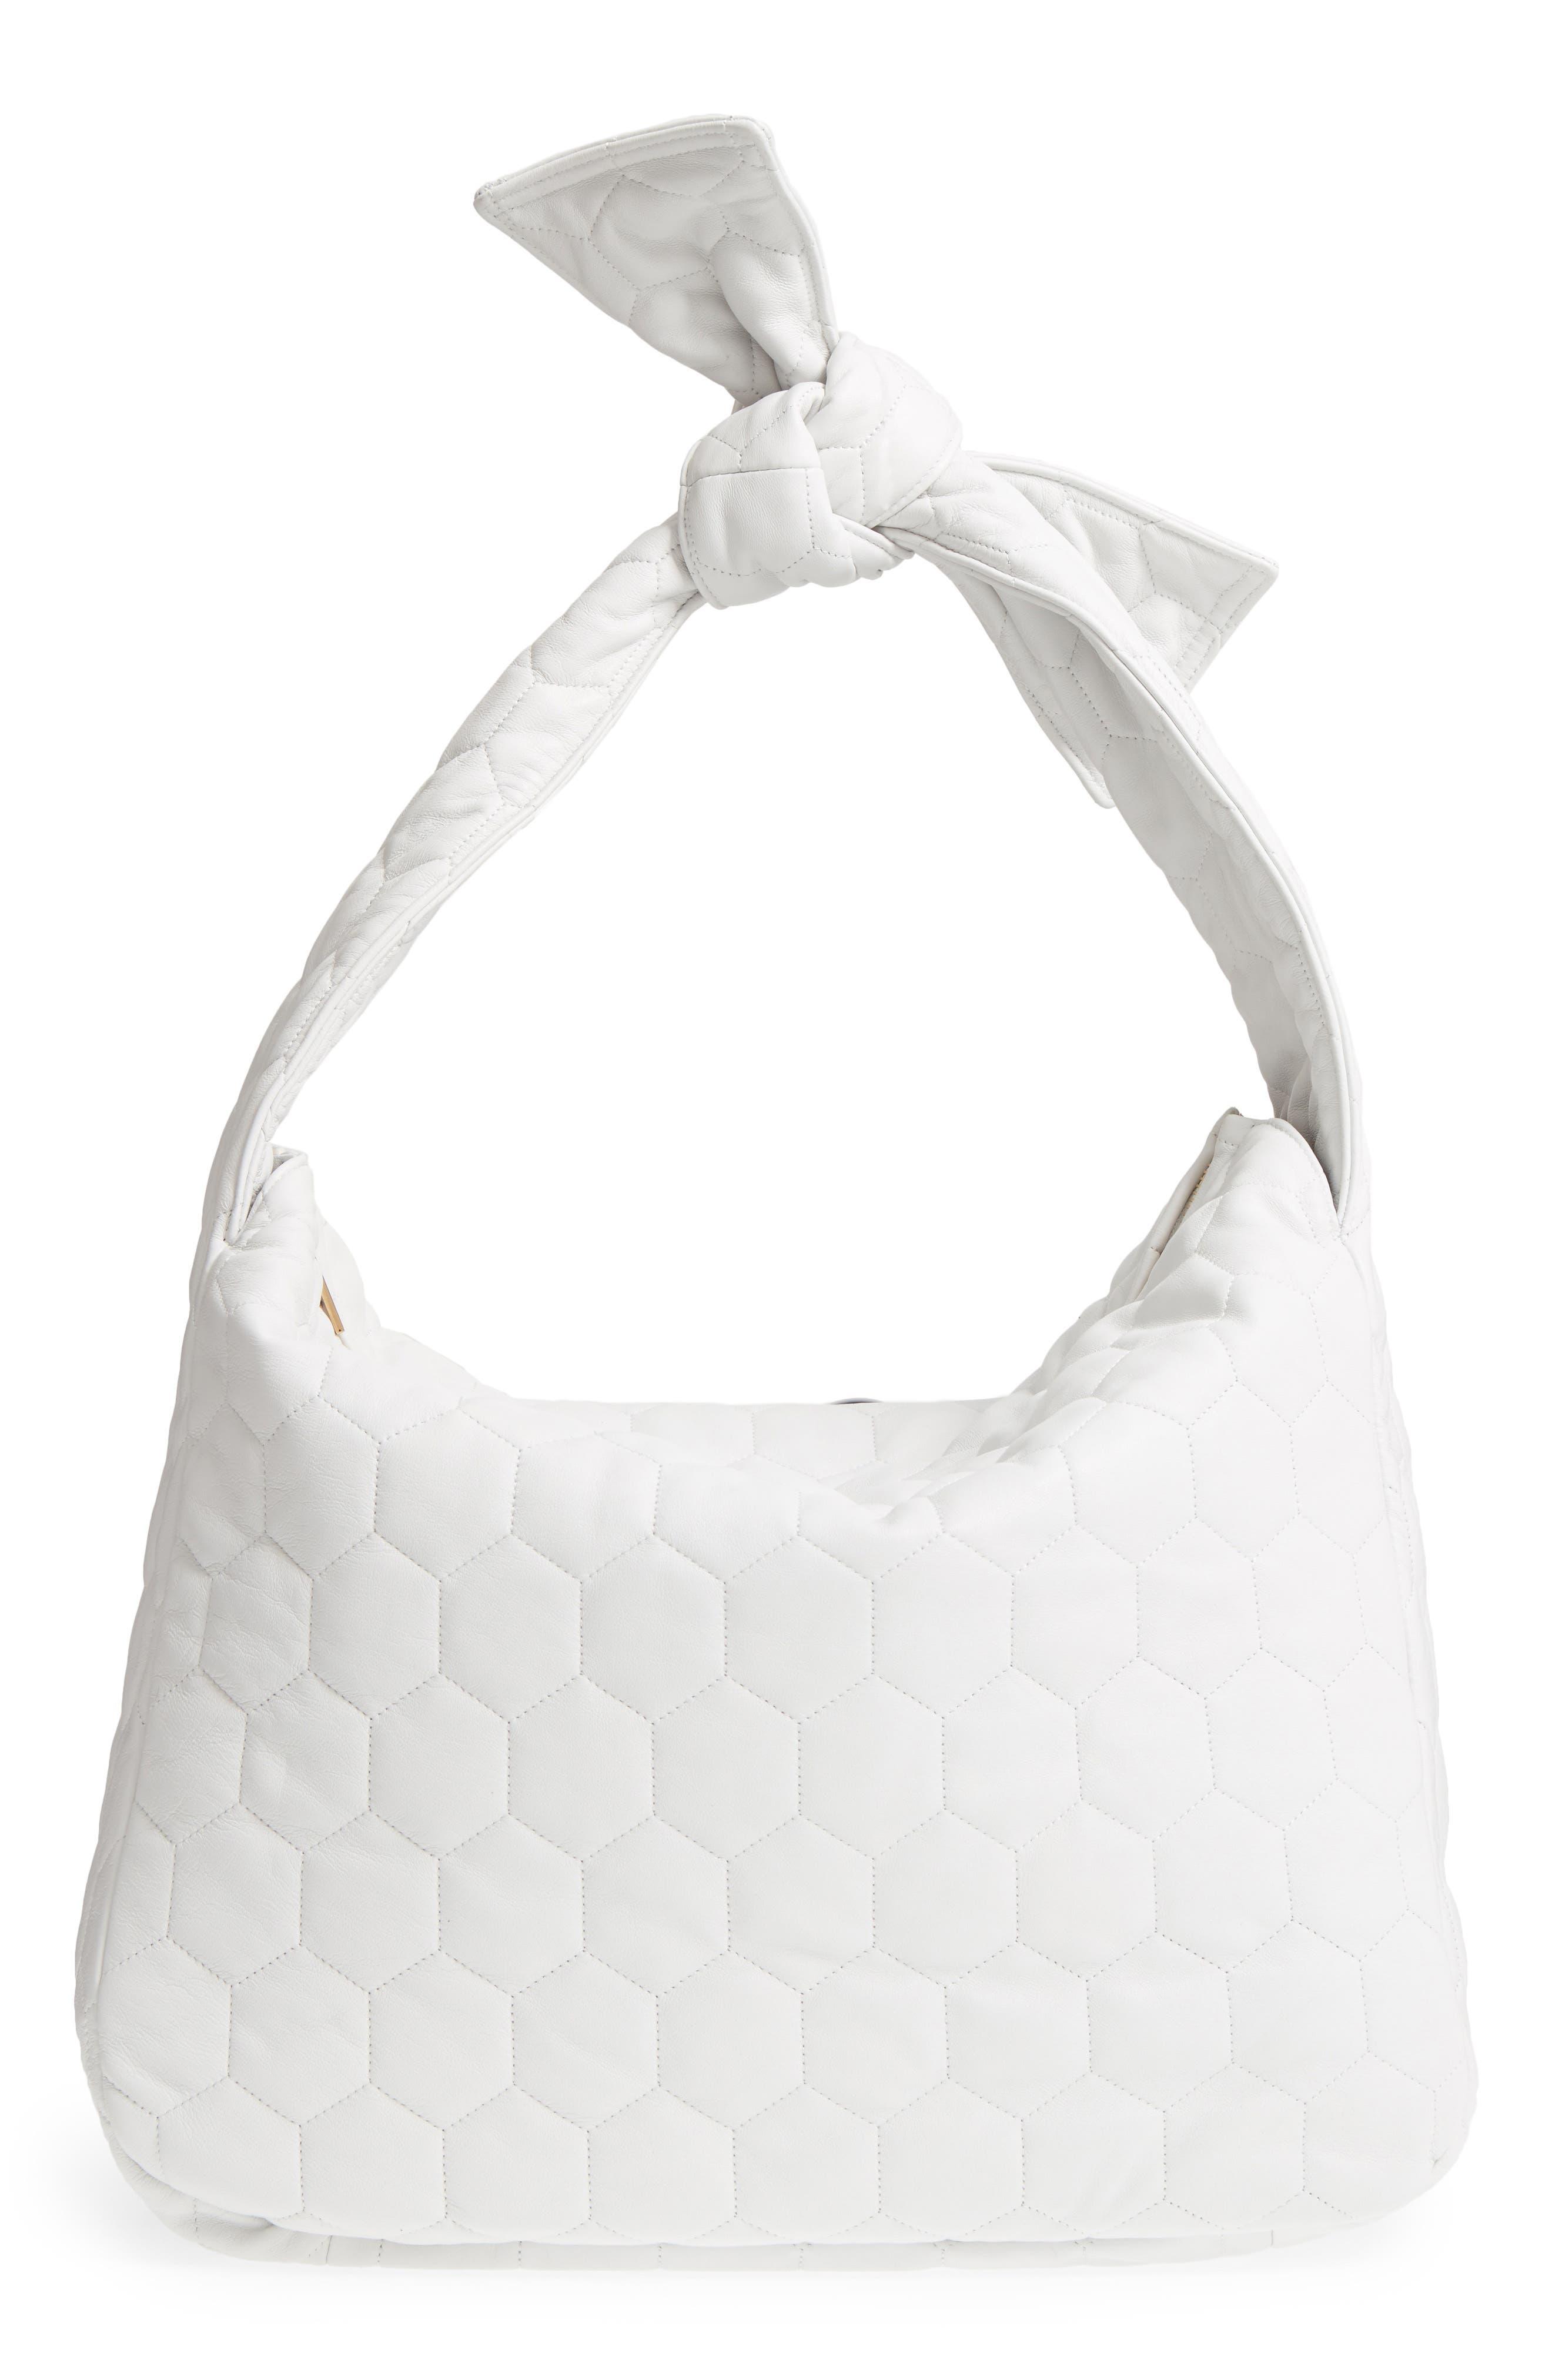 Balloon Leather Shoulder Bag,                         Main,                         color, White